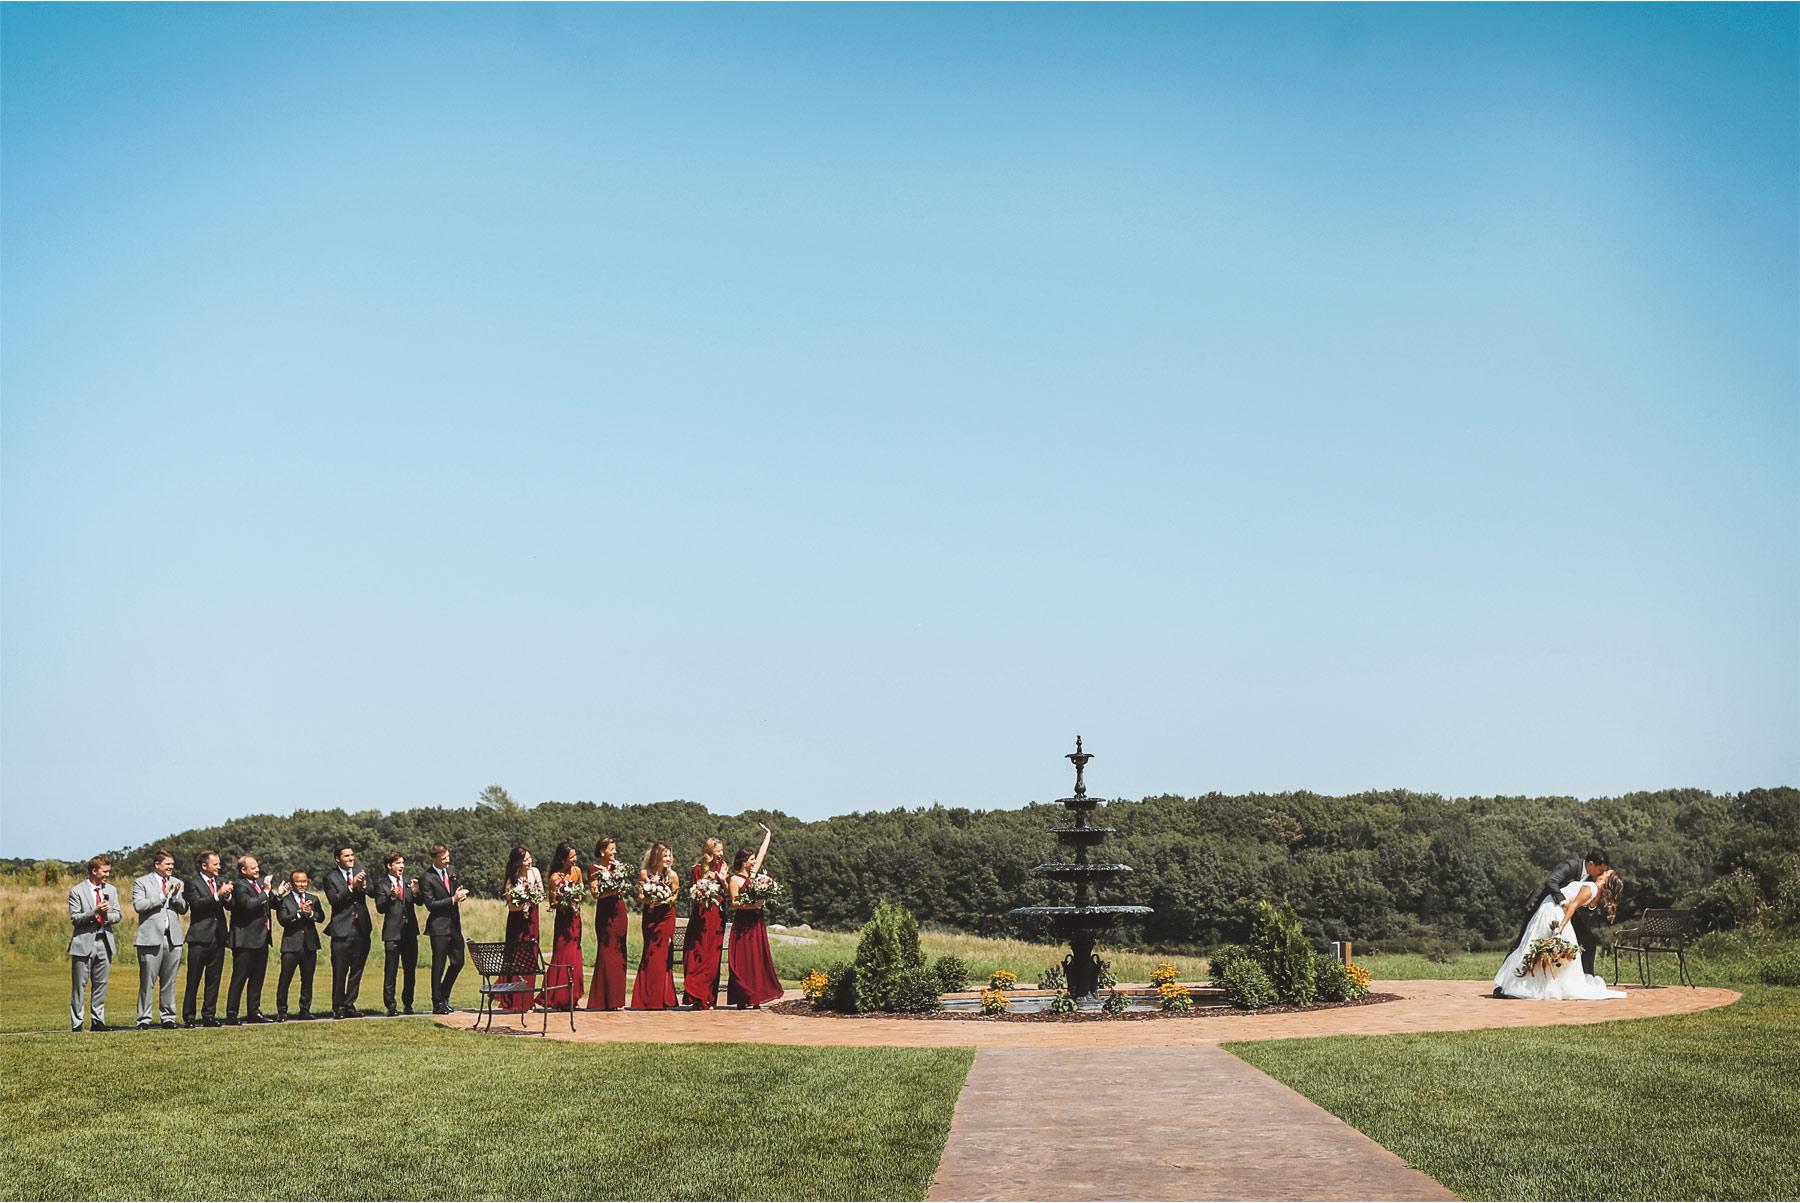 10-Weding-by-Vick-Photography-Minneapolis-Minnesota-Bavaria-Downs-Bride-Groom-Kiss-Bridesmaids-Groomsmen-Kiss-Fountain-Rebecca-and-Mark.jpg